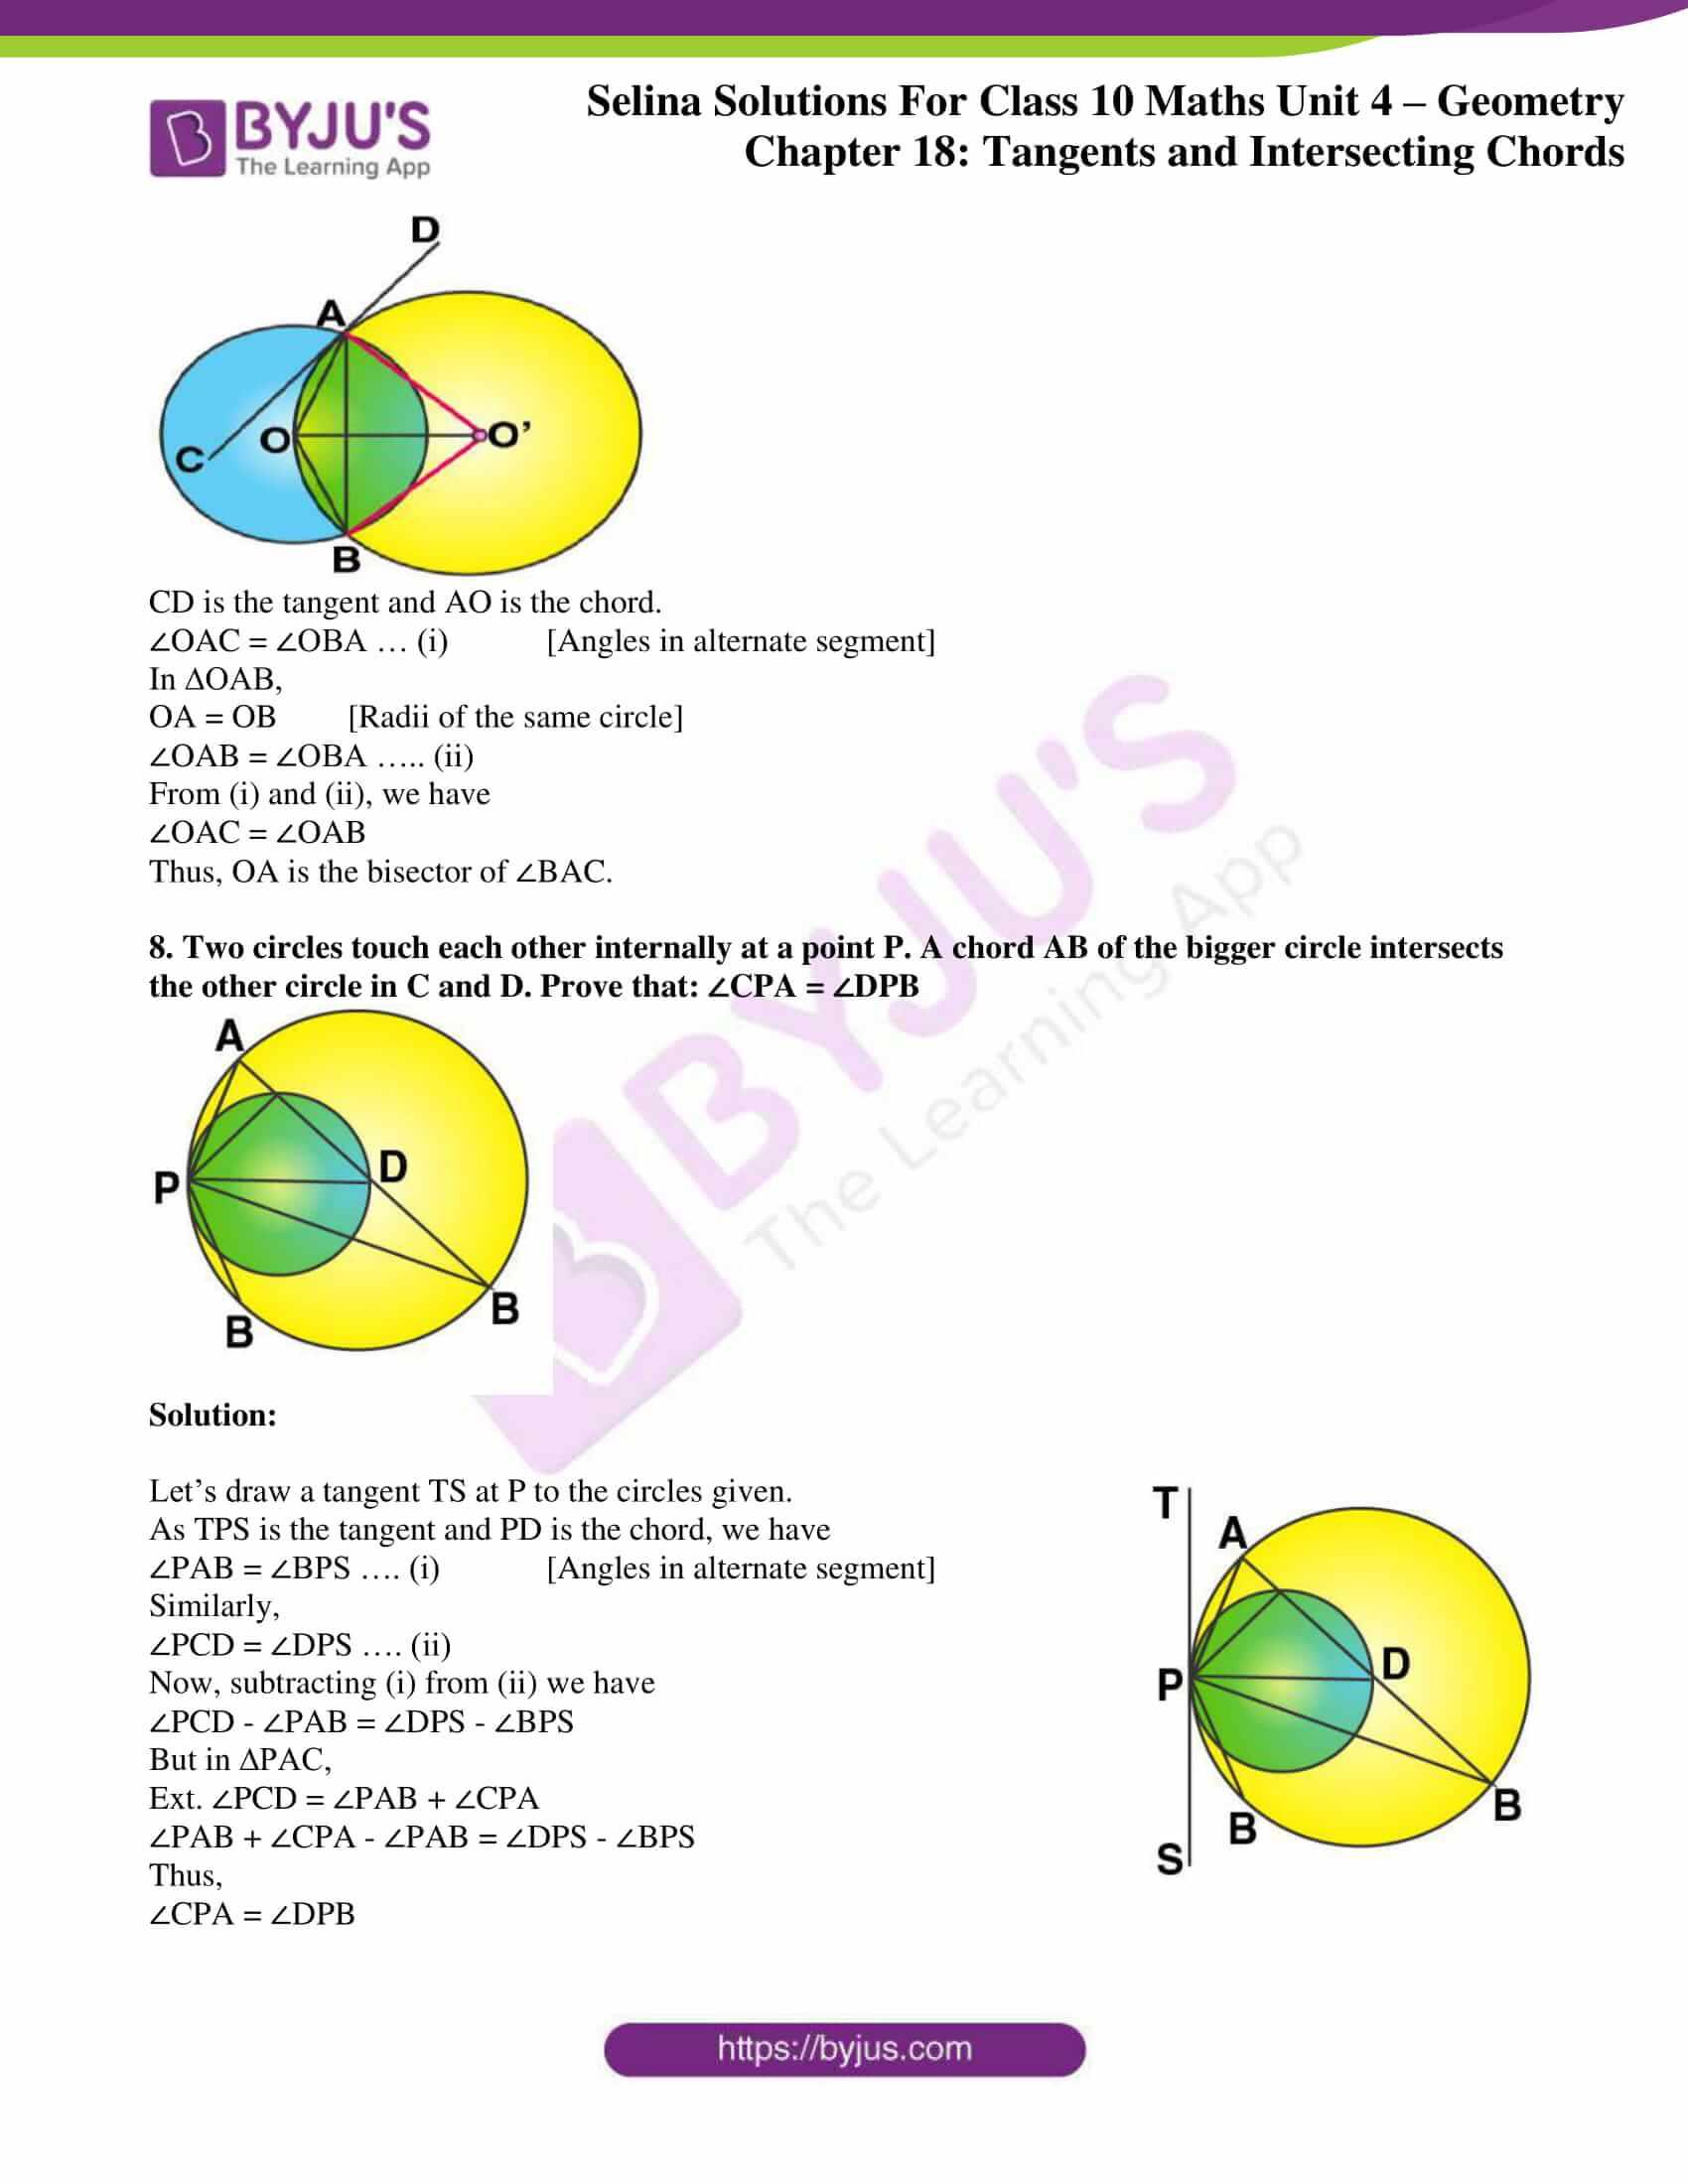 selina-sol-maths-class-10-ch-18-ex-b-5